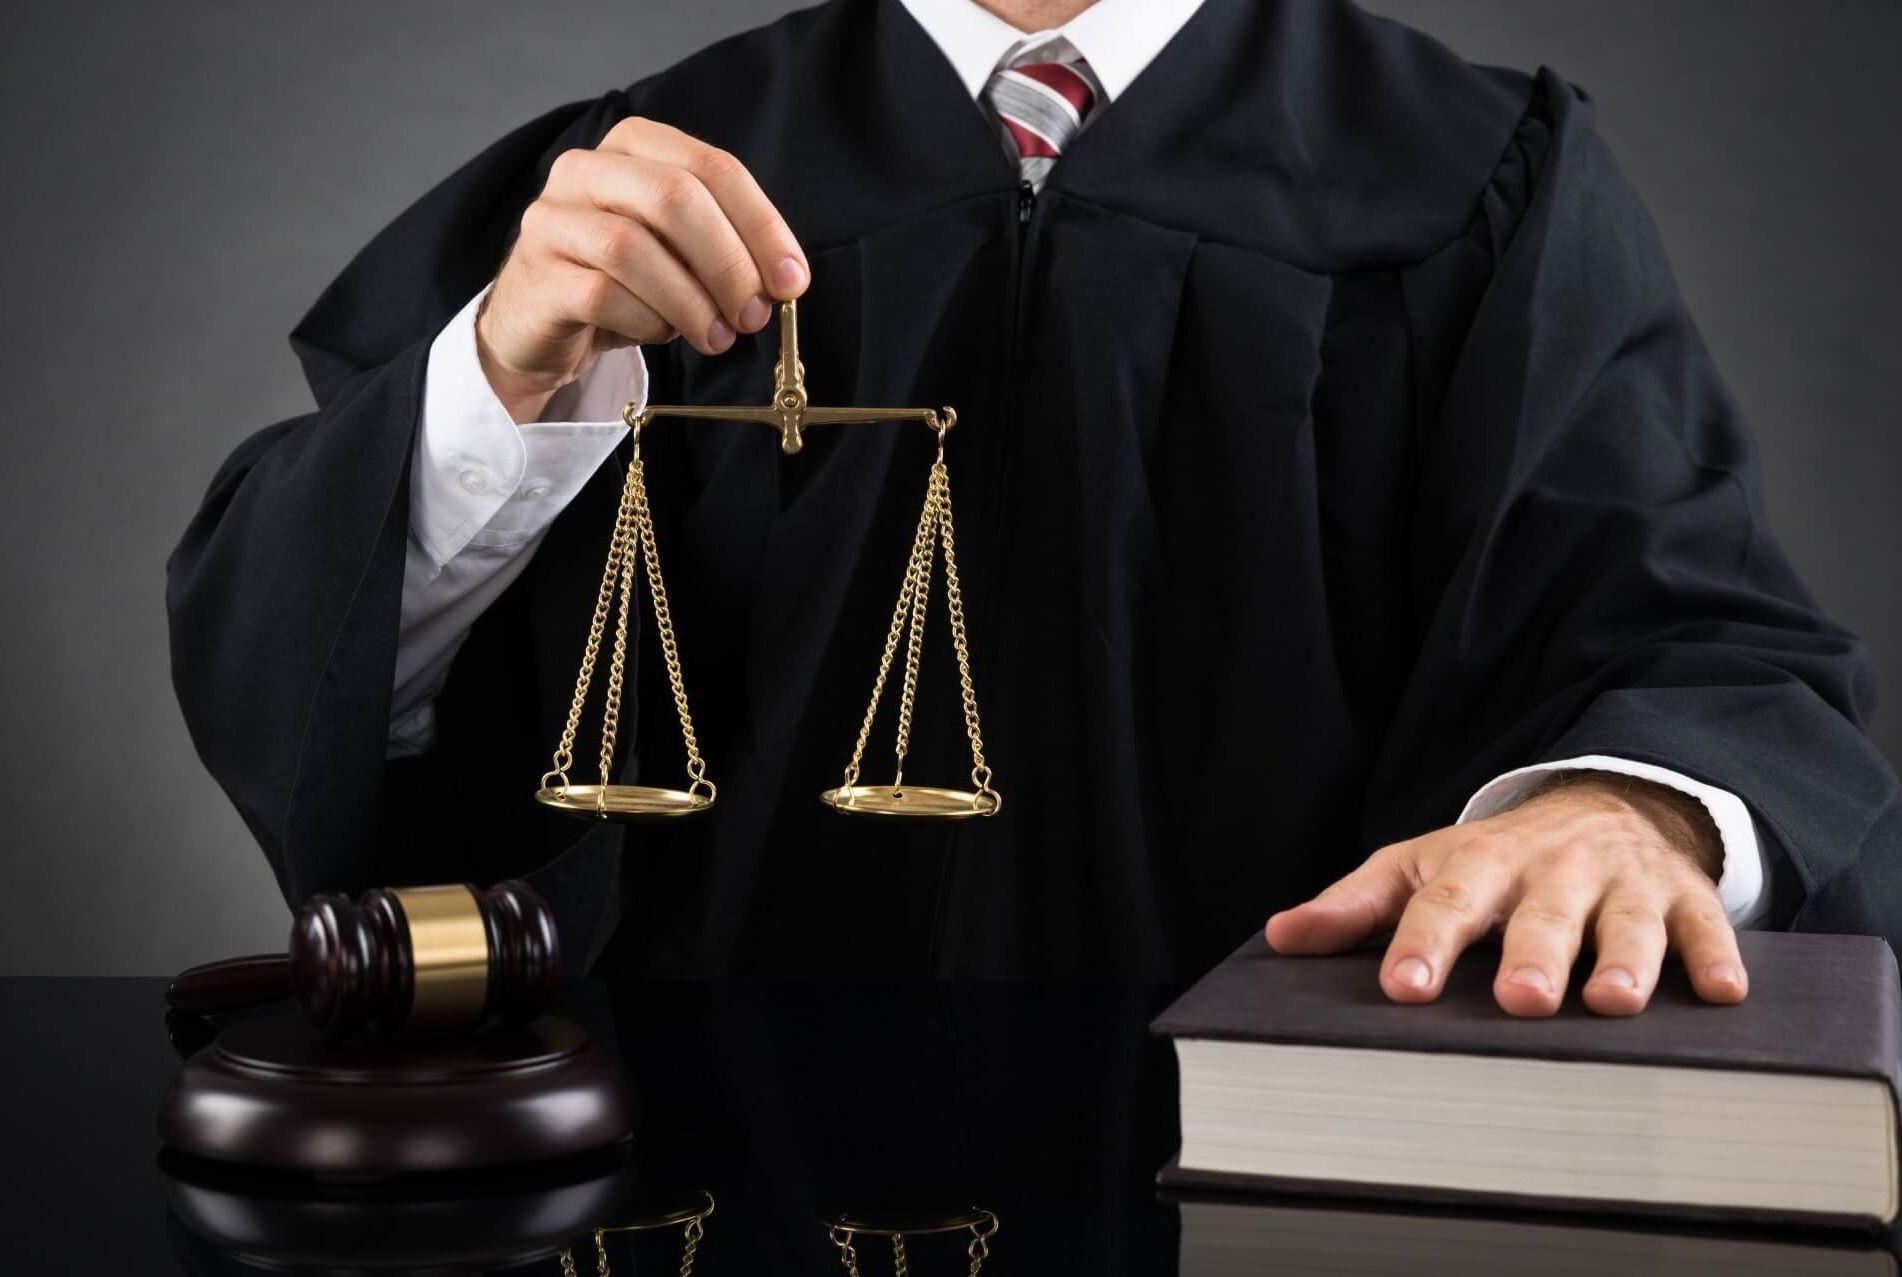 банкротство суд общей юрисдикции